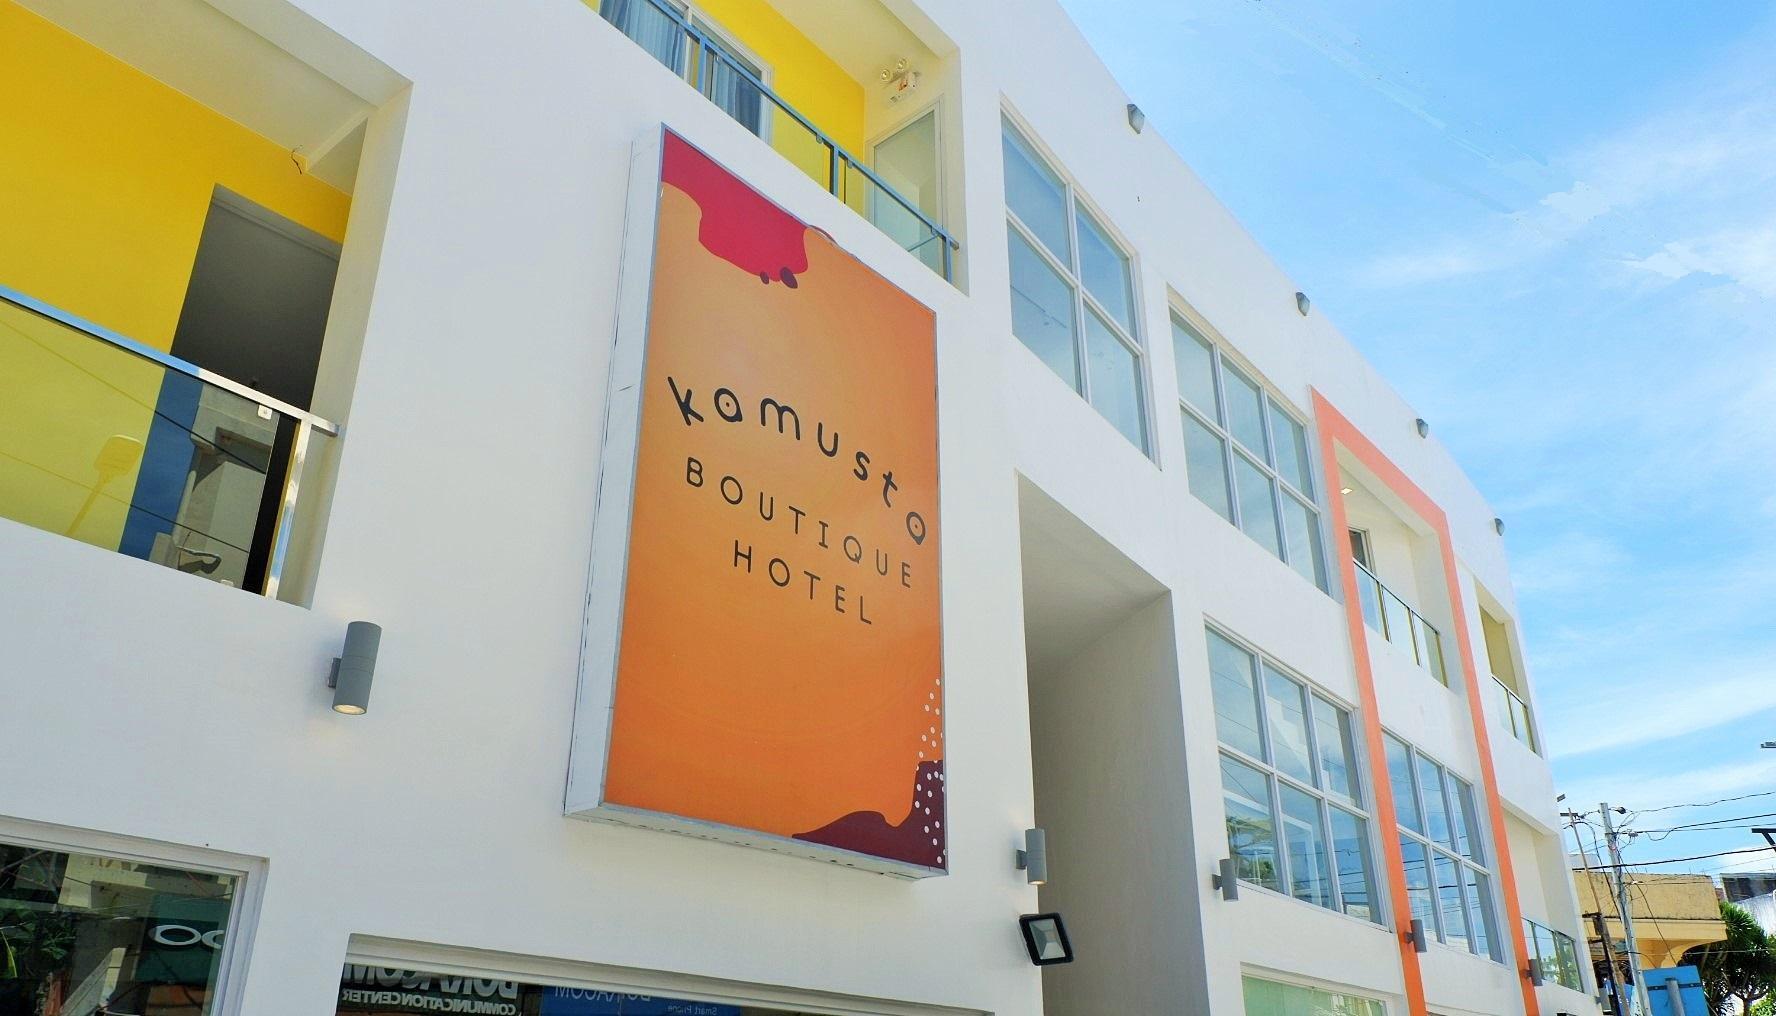 Kamusta Boutique Hotel